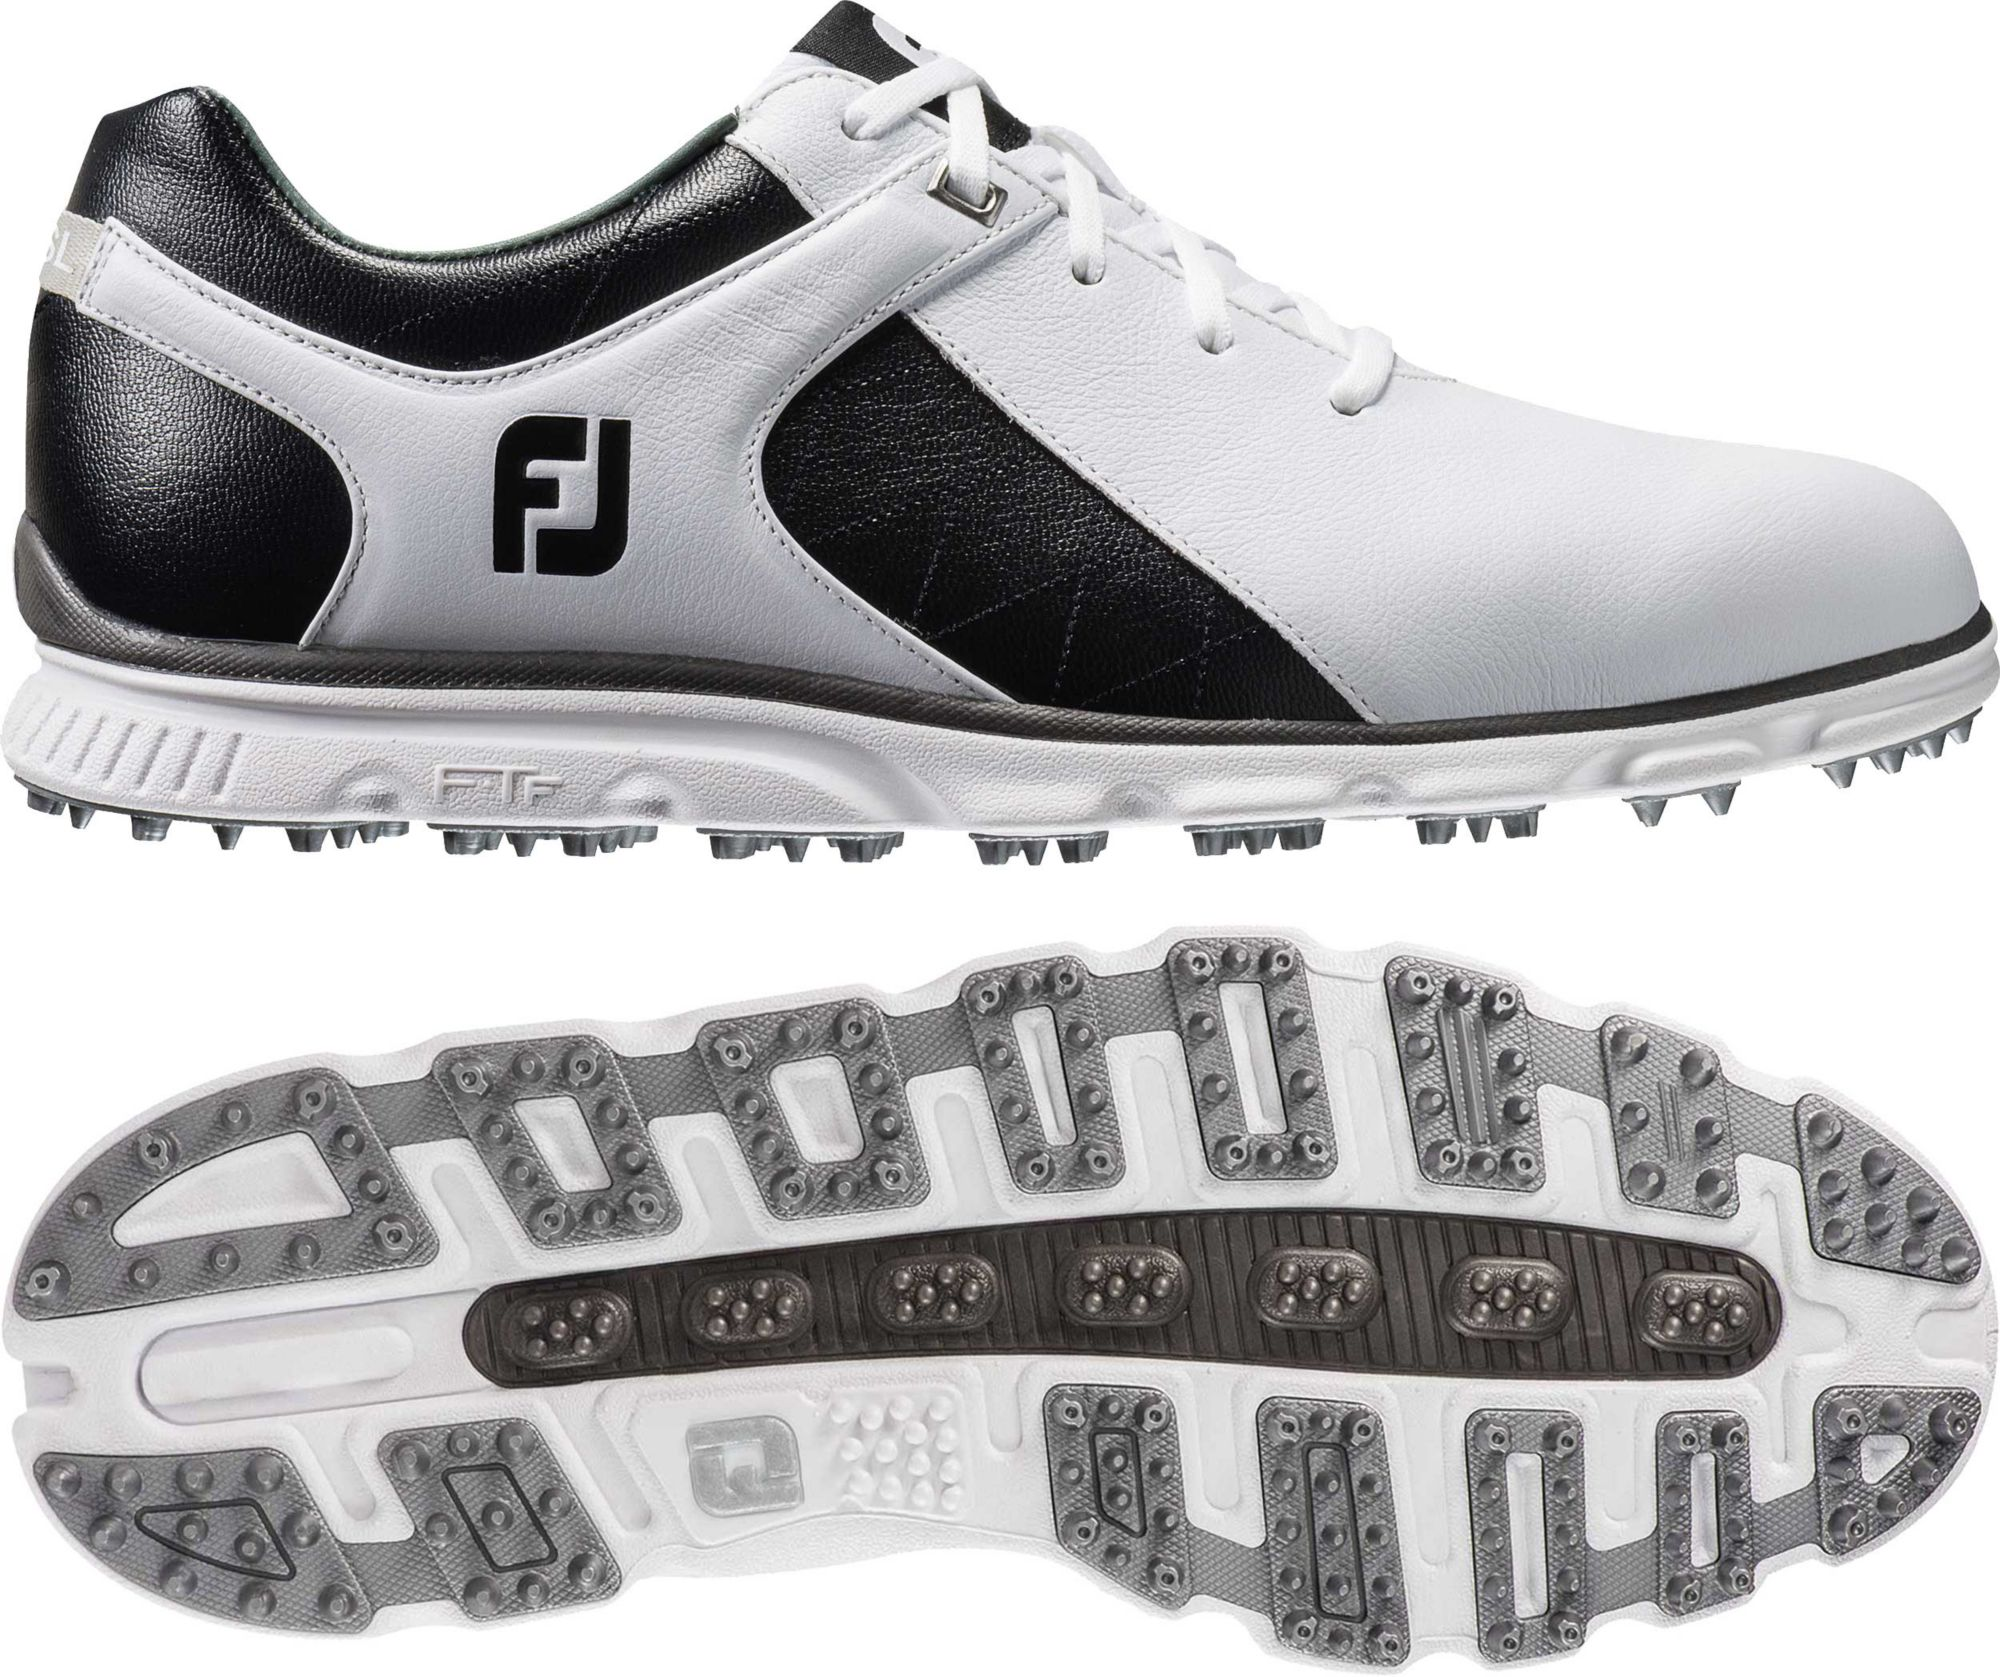 04bf7f9164e1f3 FootJoy Men s Pro SL Golf Shoes (Previous Season Style)